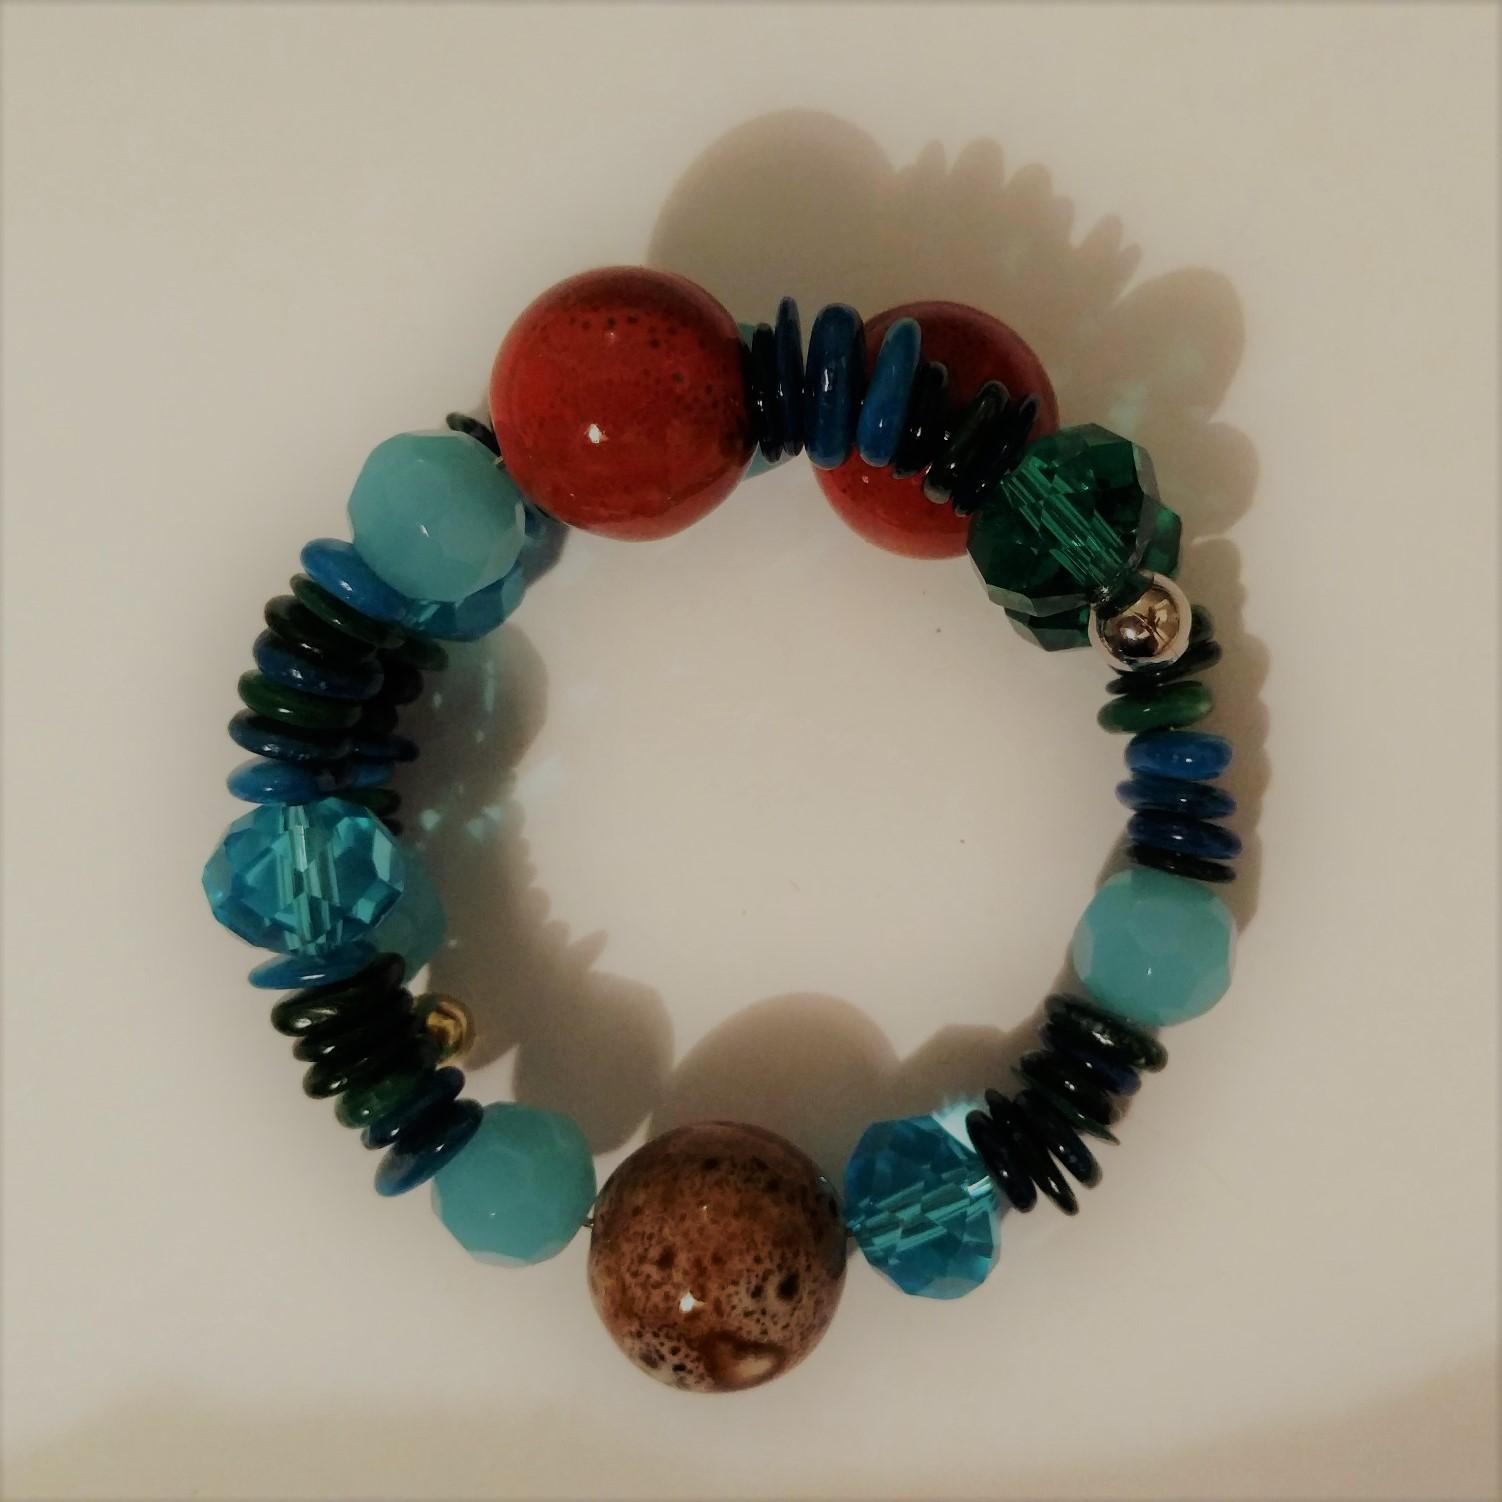 #JW-B 190026 Bracelet  Suggested $22 USD